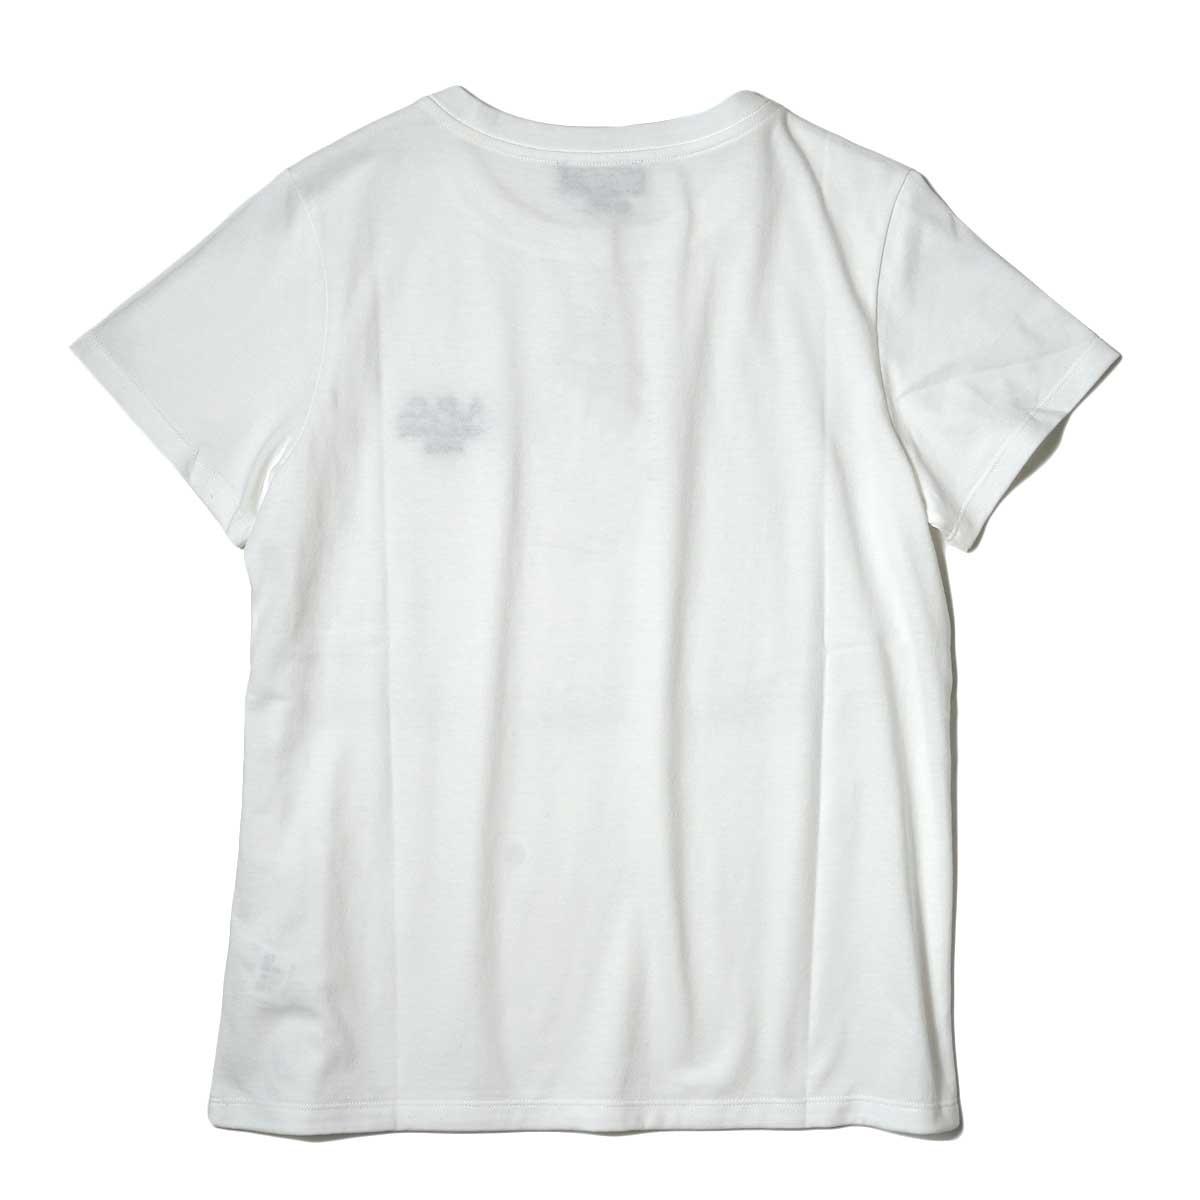 A.P.C. / Denise Tシャツ (White) 背面